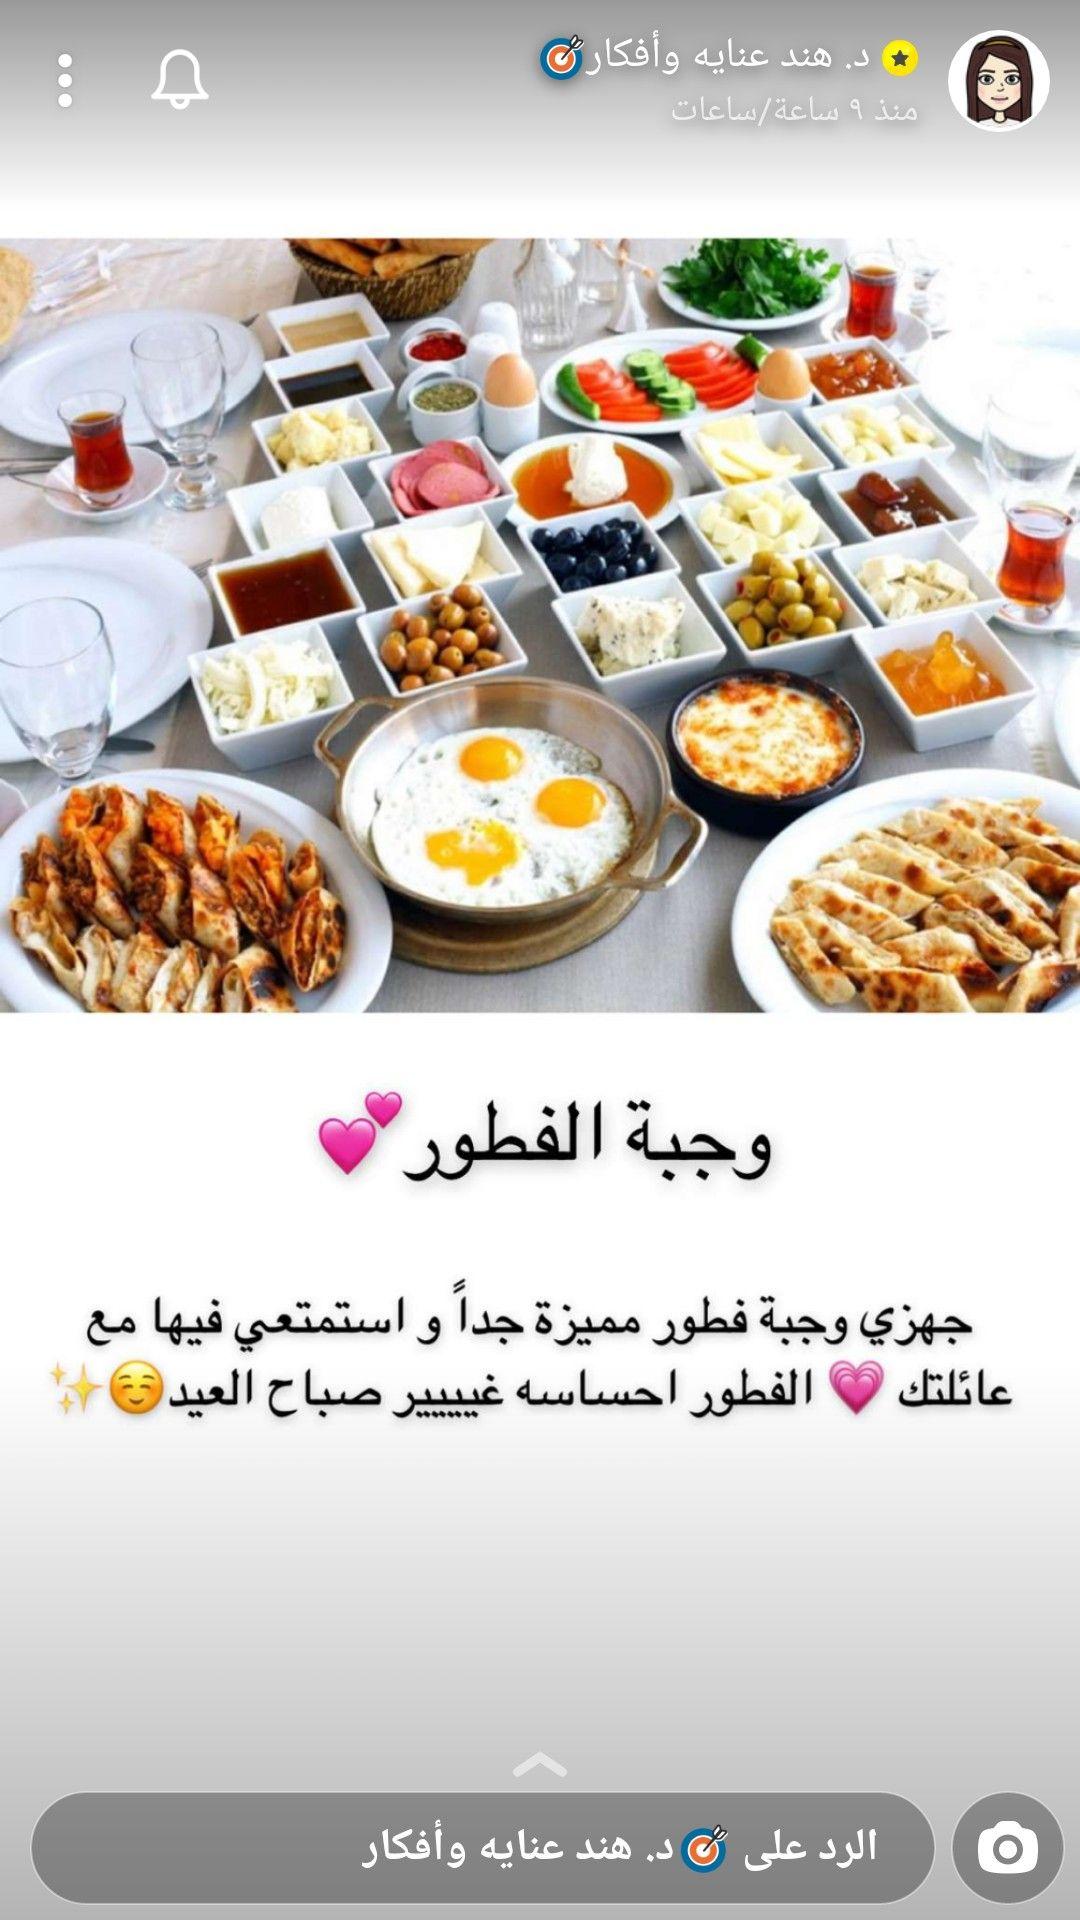 Pin By Raneem On د هند عنايه وافكار Food Presentation Food Cooking Recipes